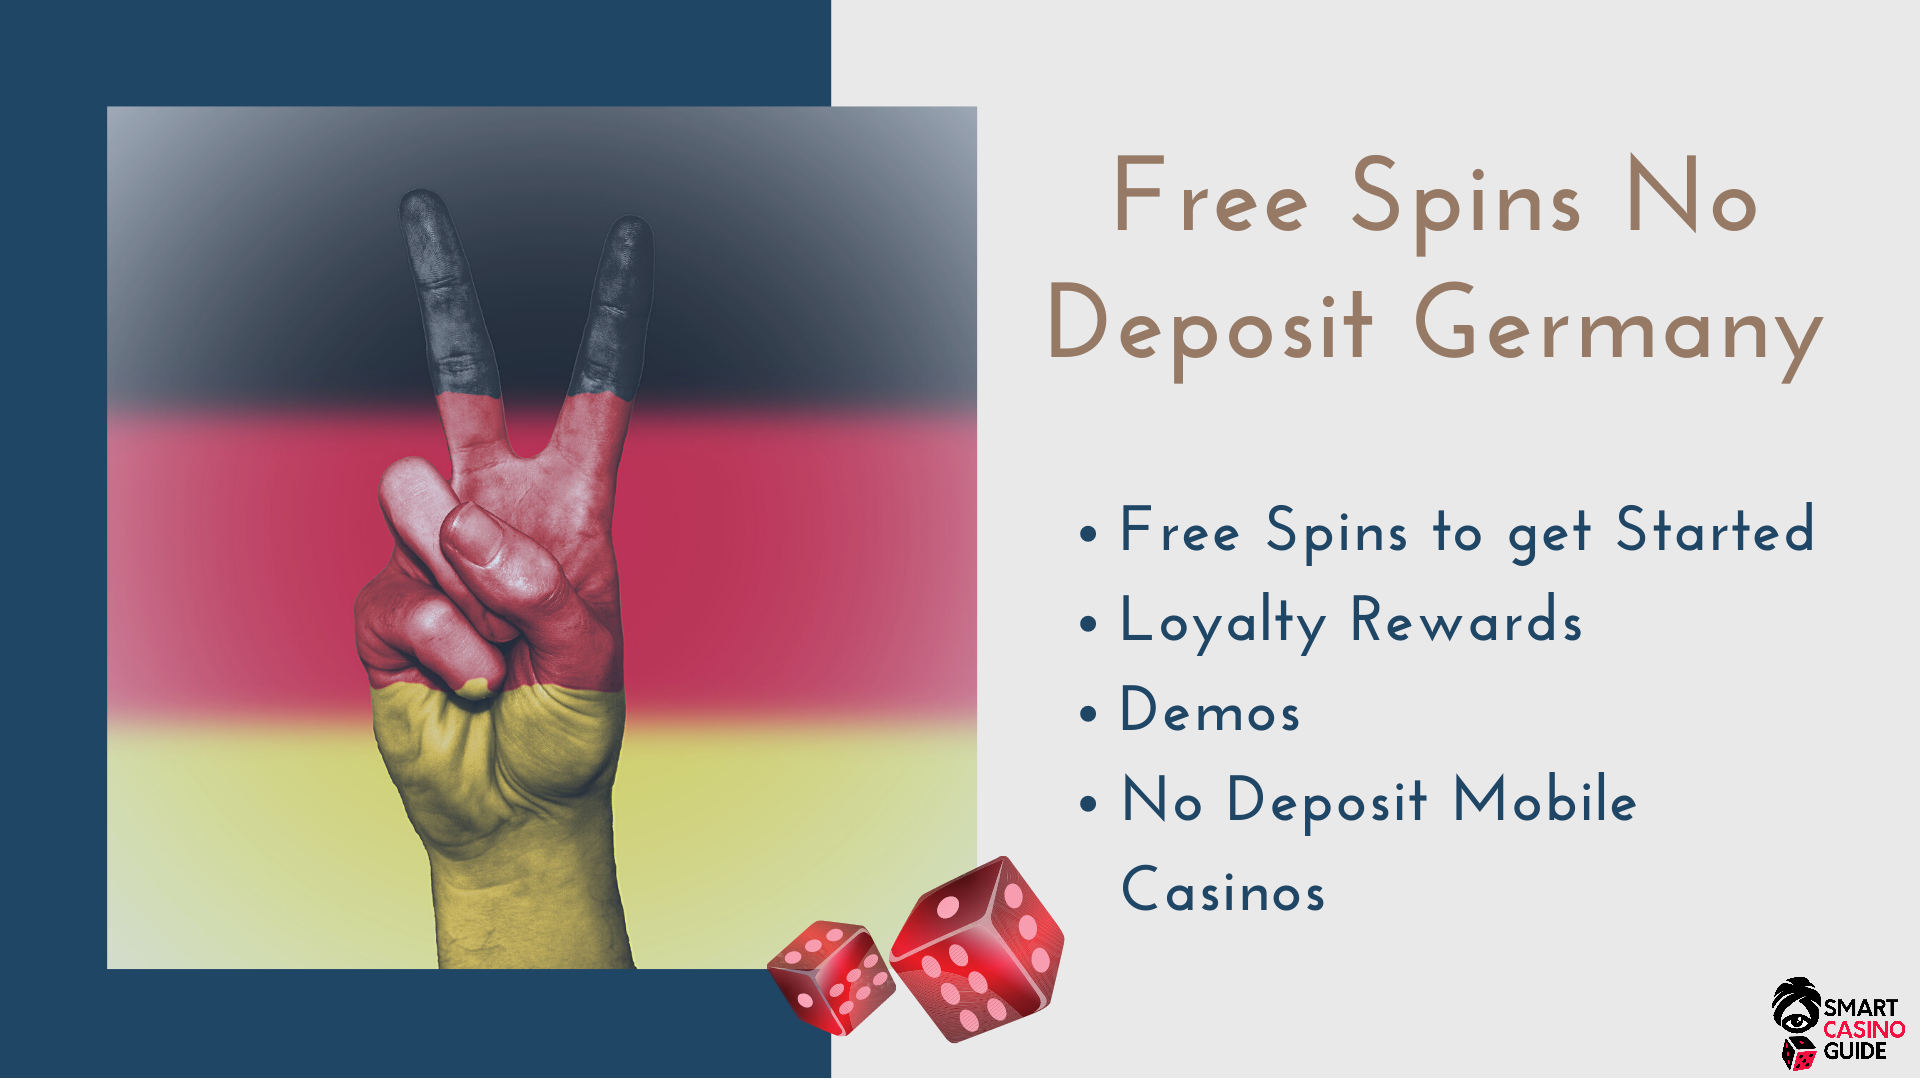 50 free spins no deposit germany